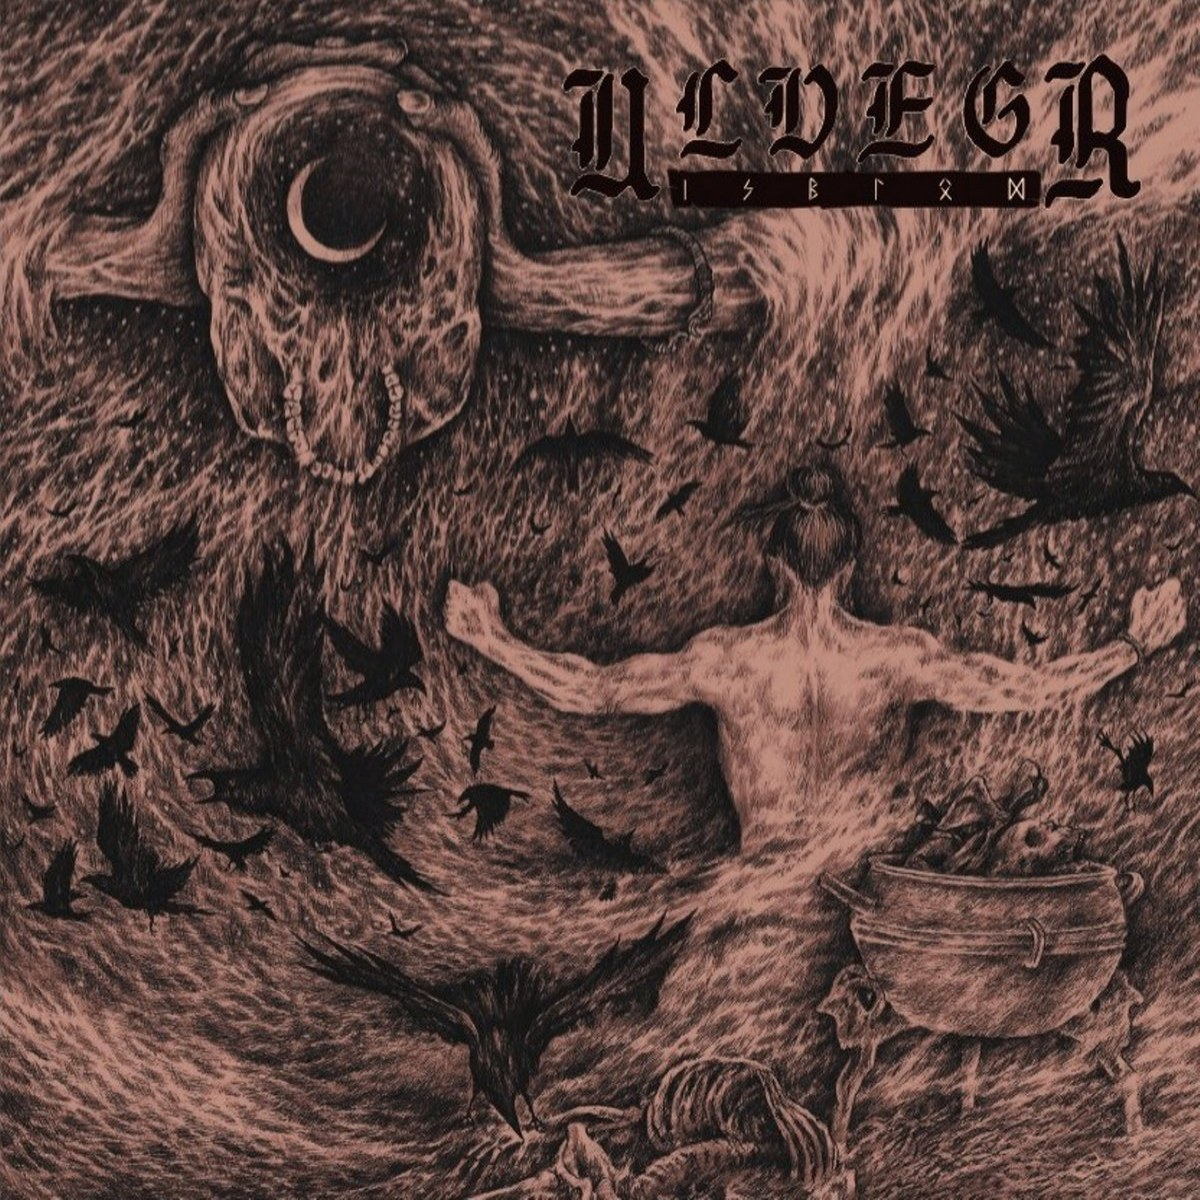 Ulvegr - Isblod